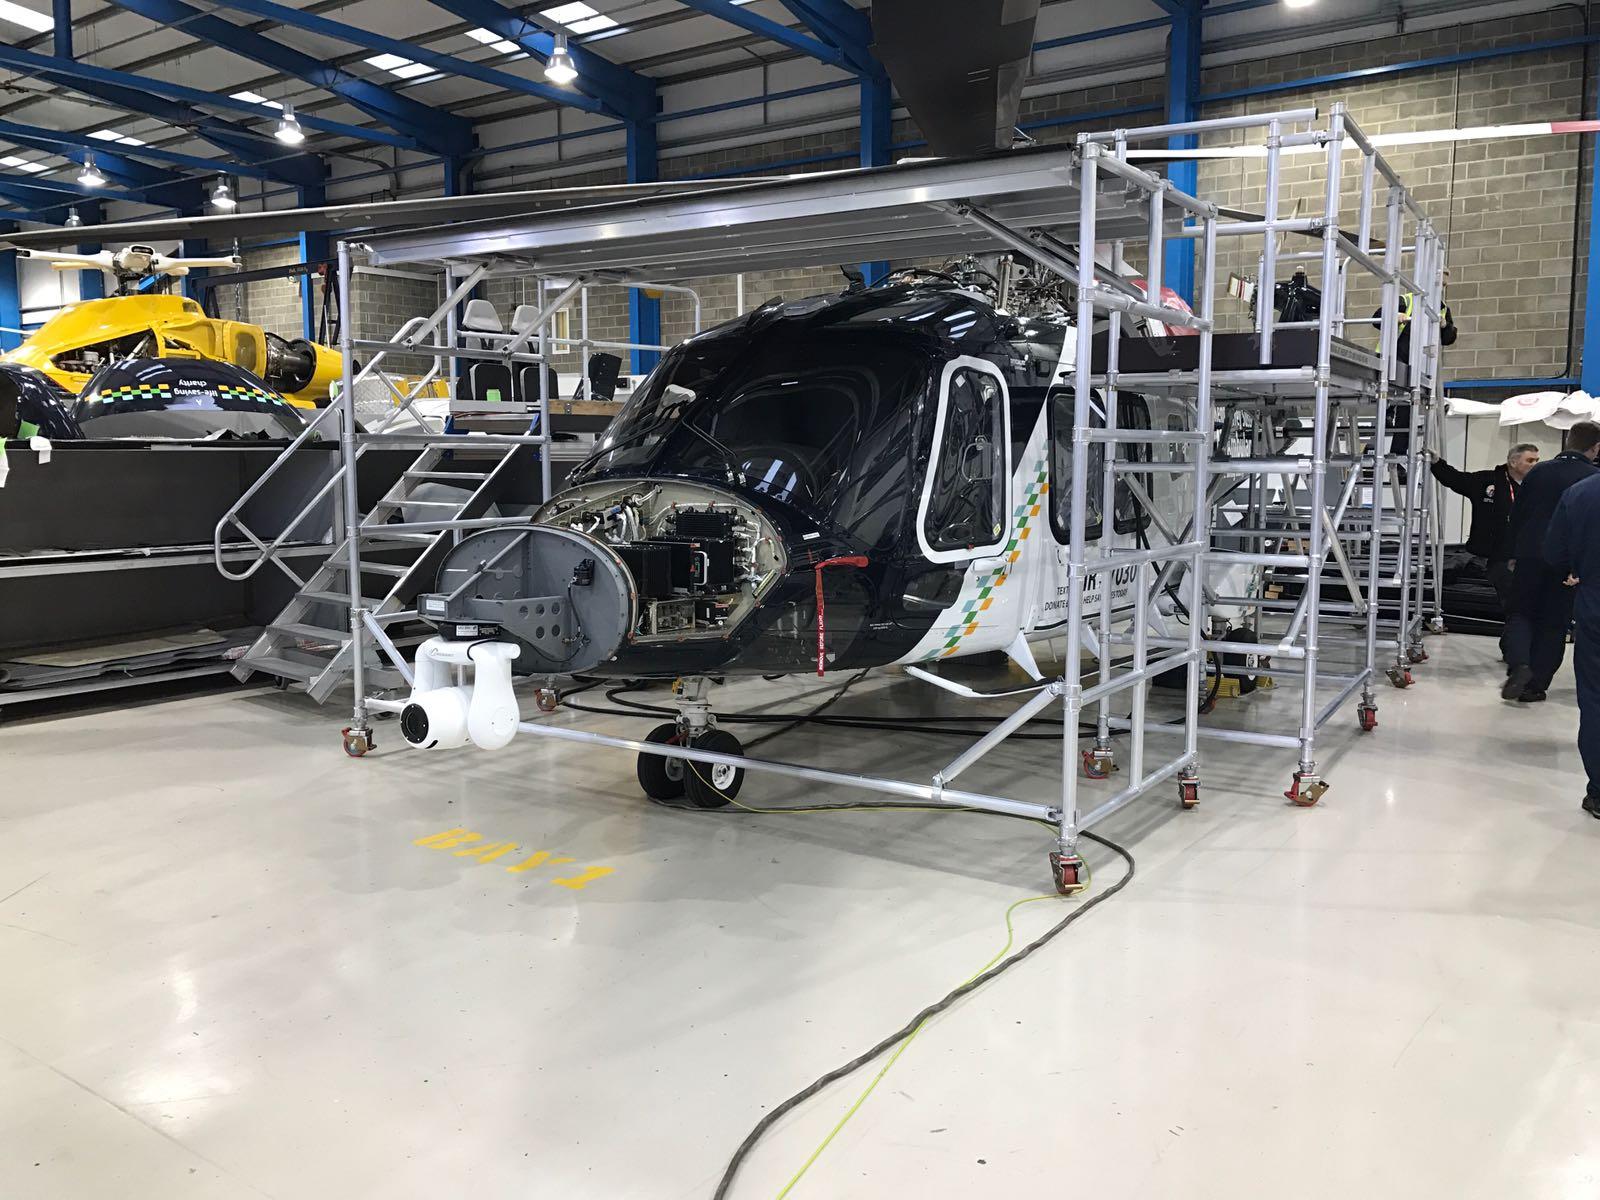 Aviation & Aircraft